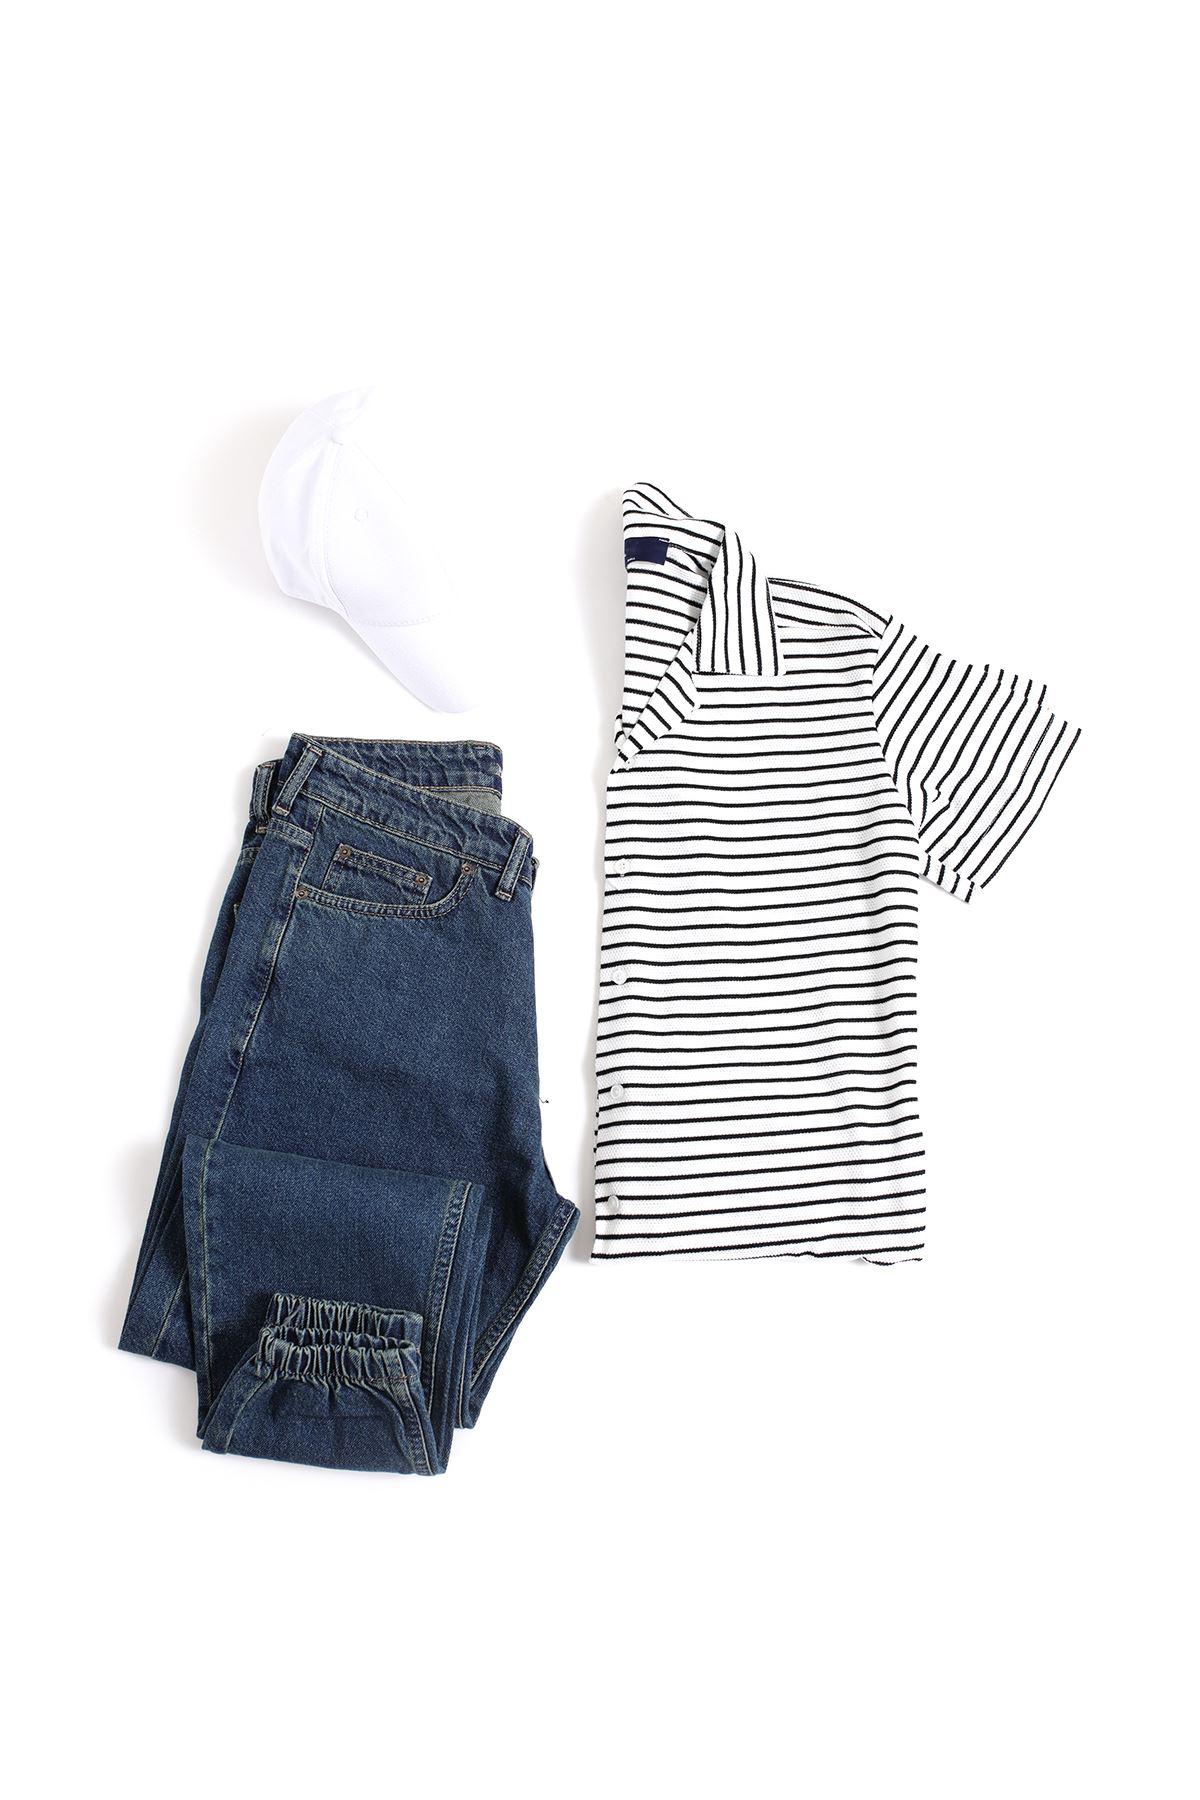 Siyah Çizgili Beyaz Triko Gömlek Lacivert Boyfriend Kot Kombin